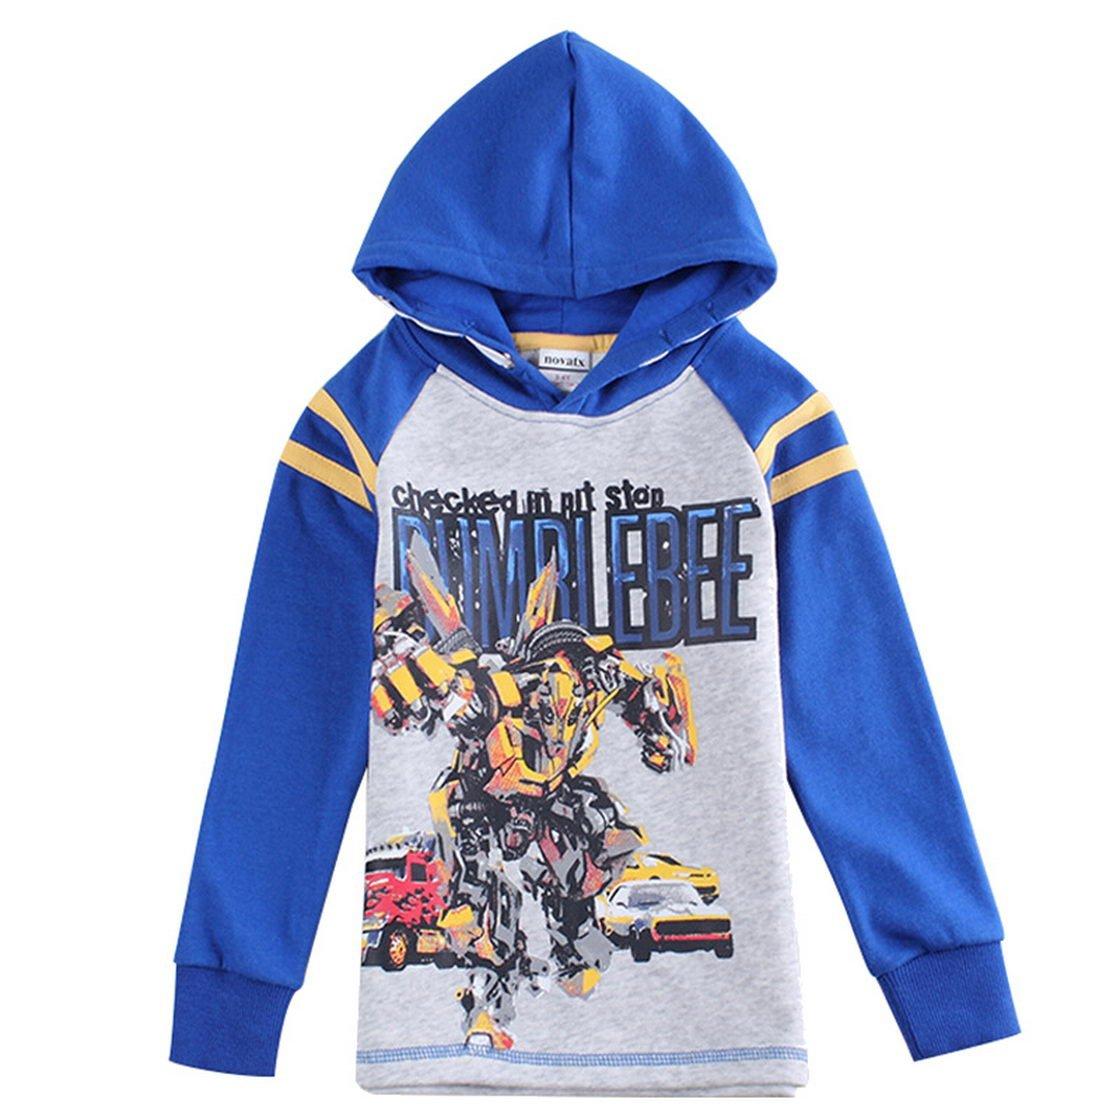 Transformers Little Boys Cartoon Soft Hooded Athletic Cotton Sweatshirt Jacket Tiful